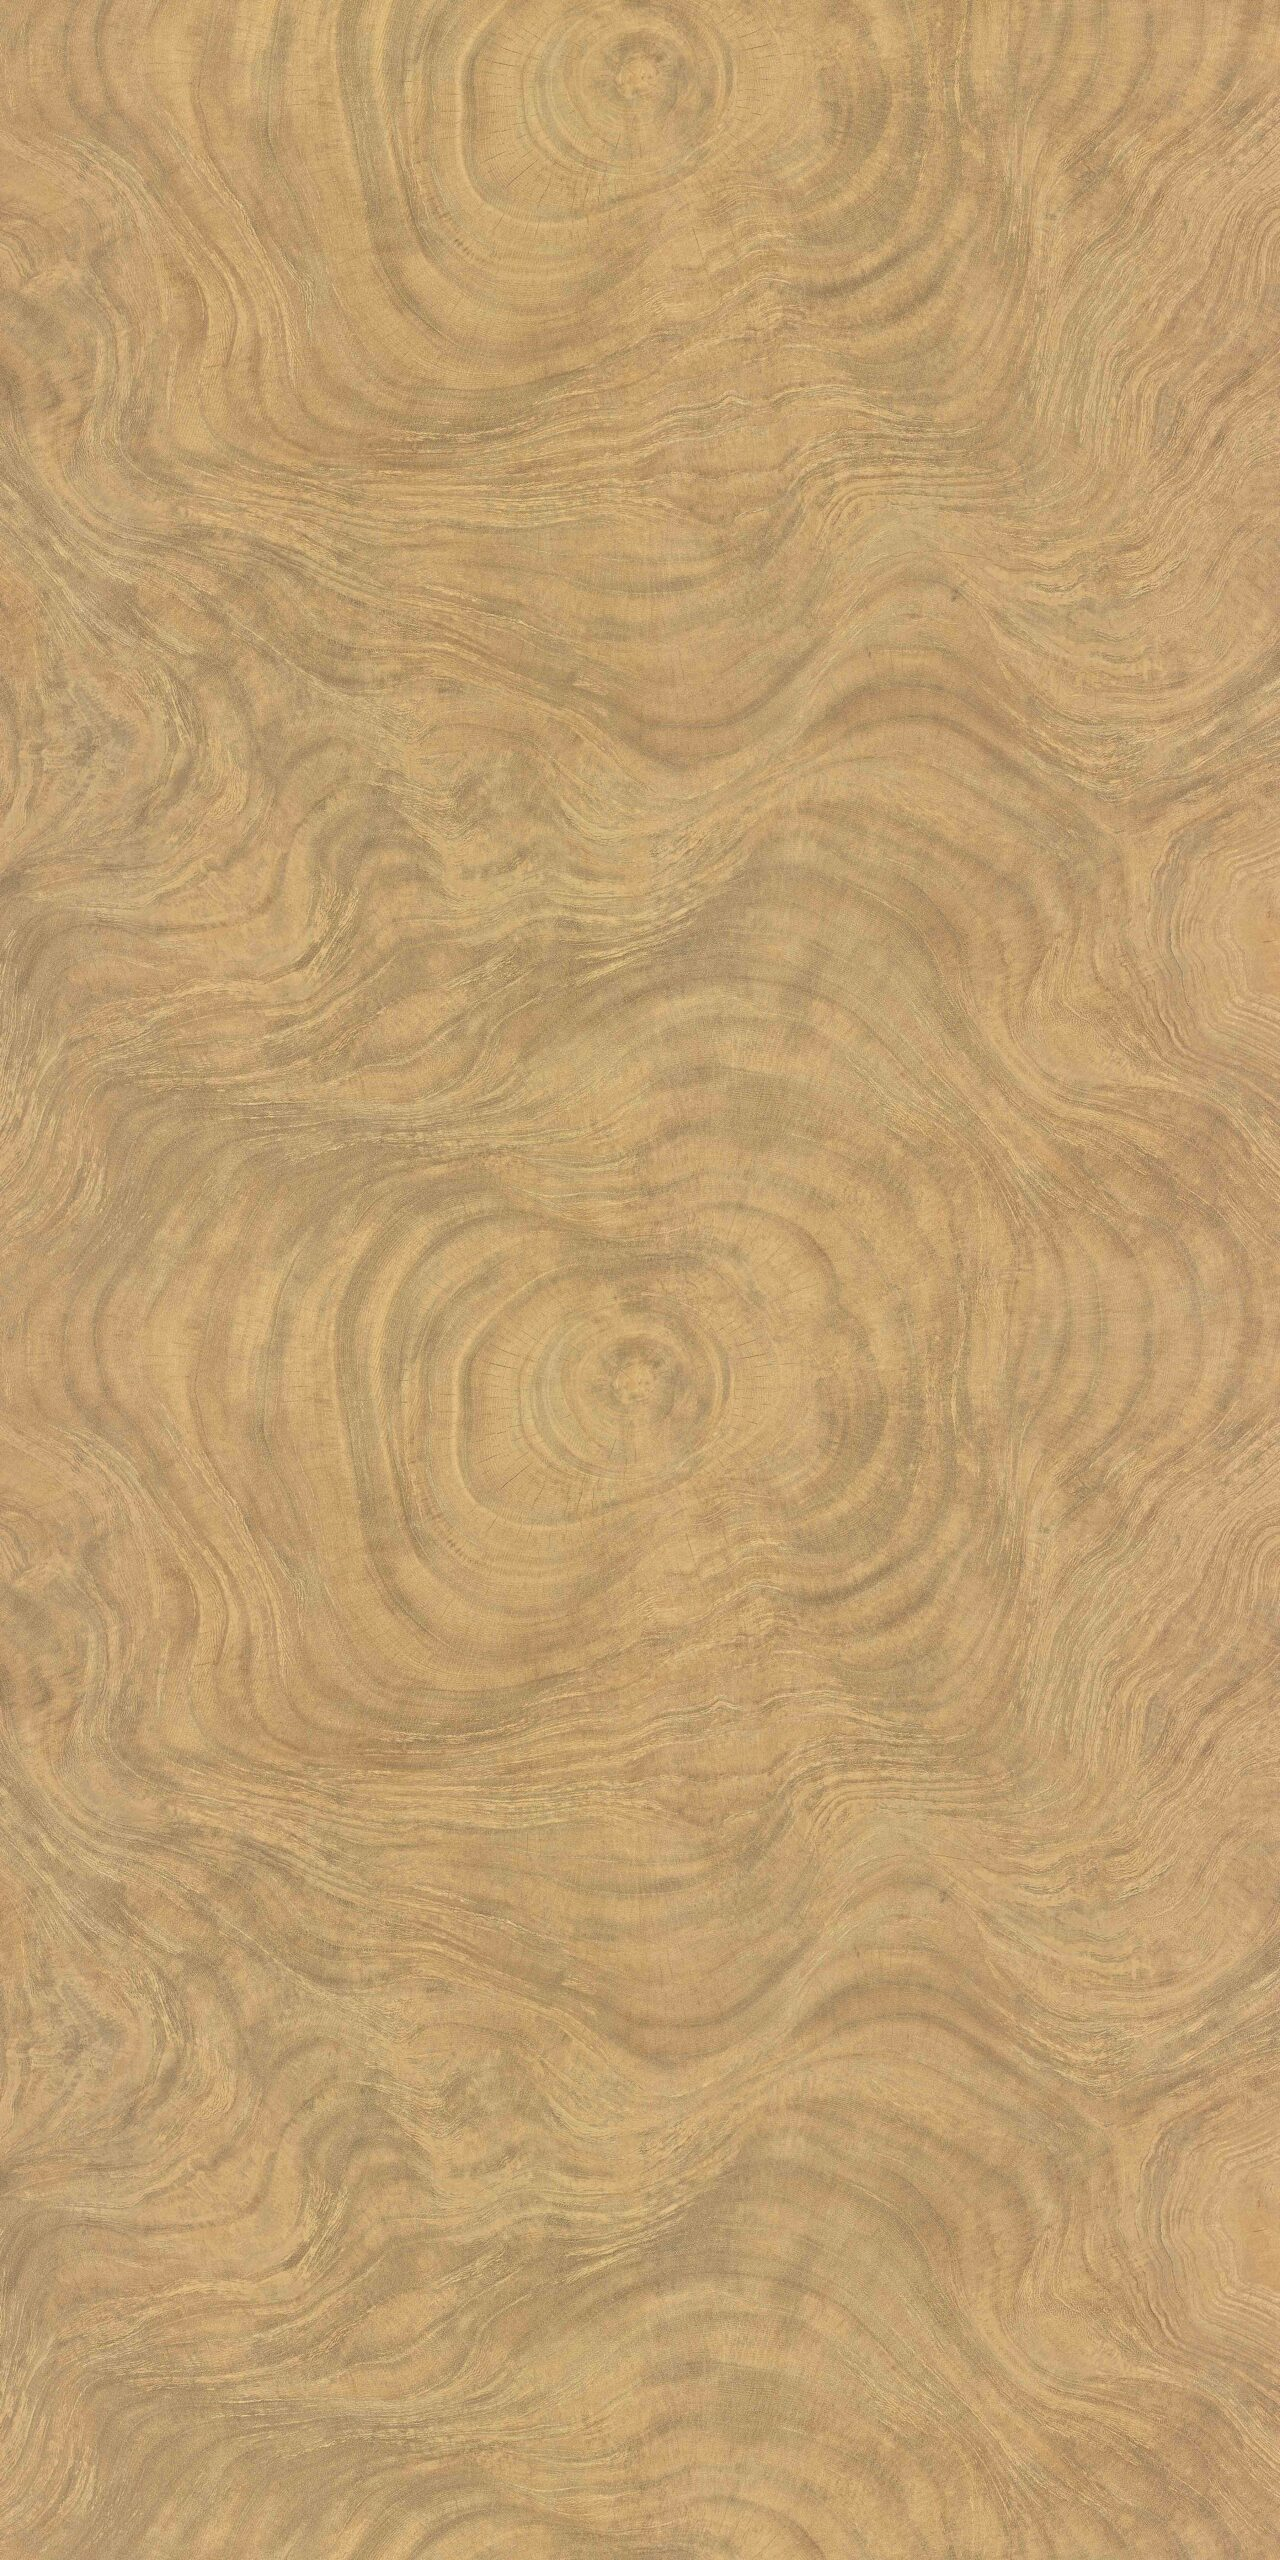 Wooden Office Furniture Laminate wood Grains 4101